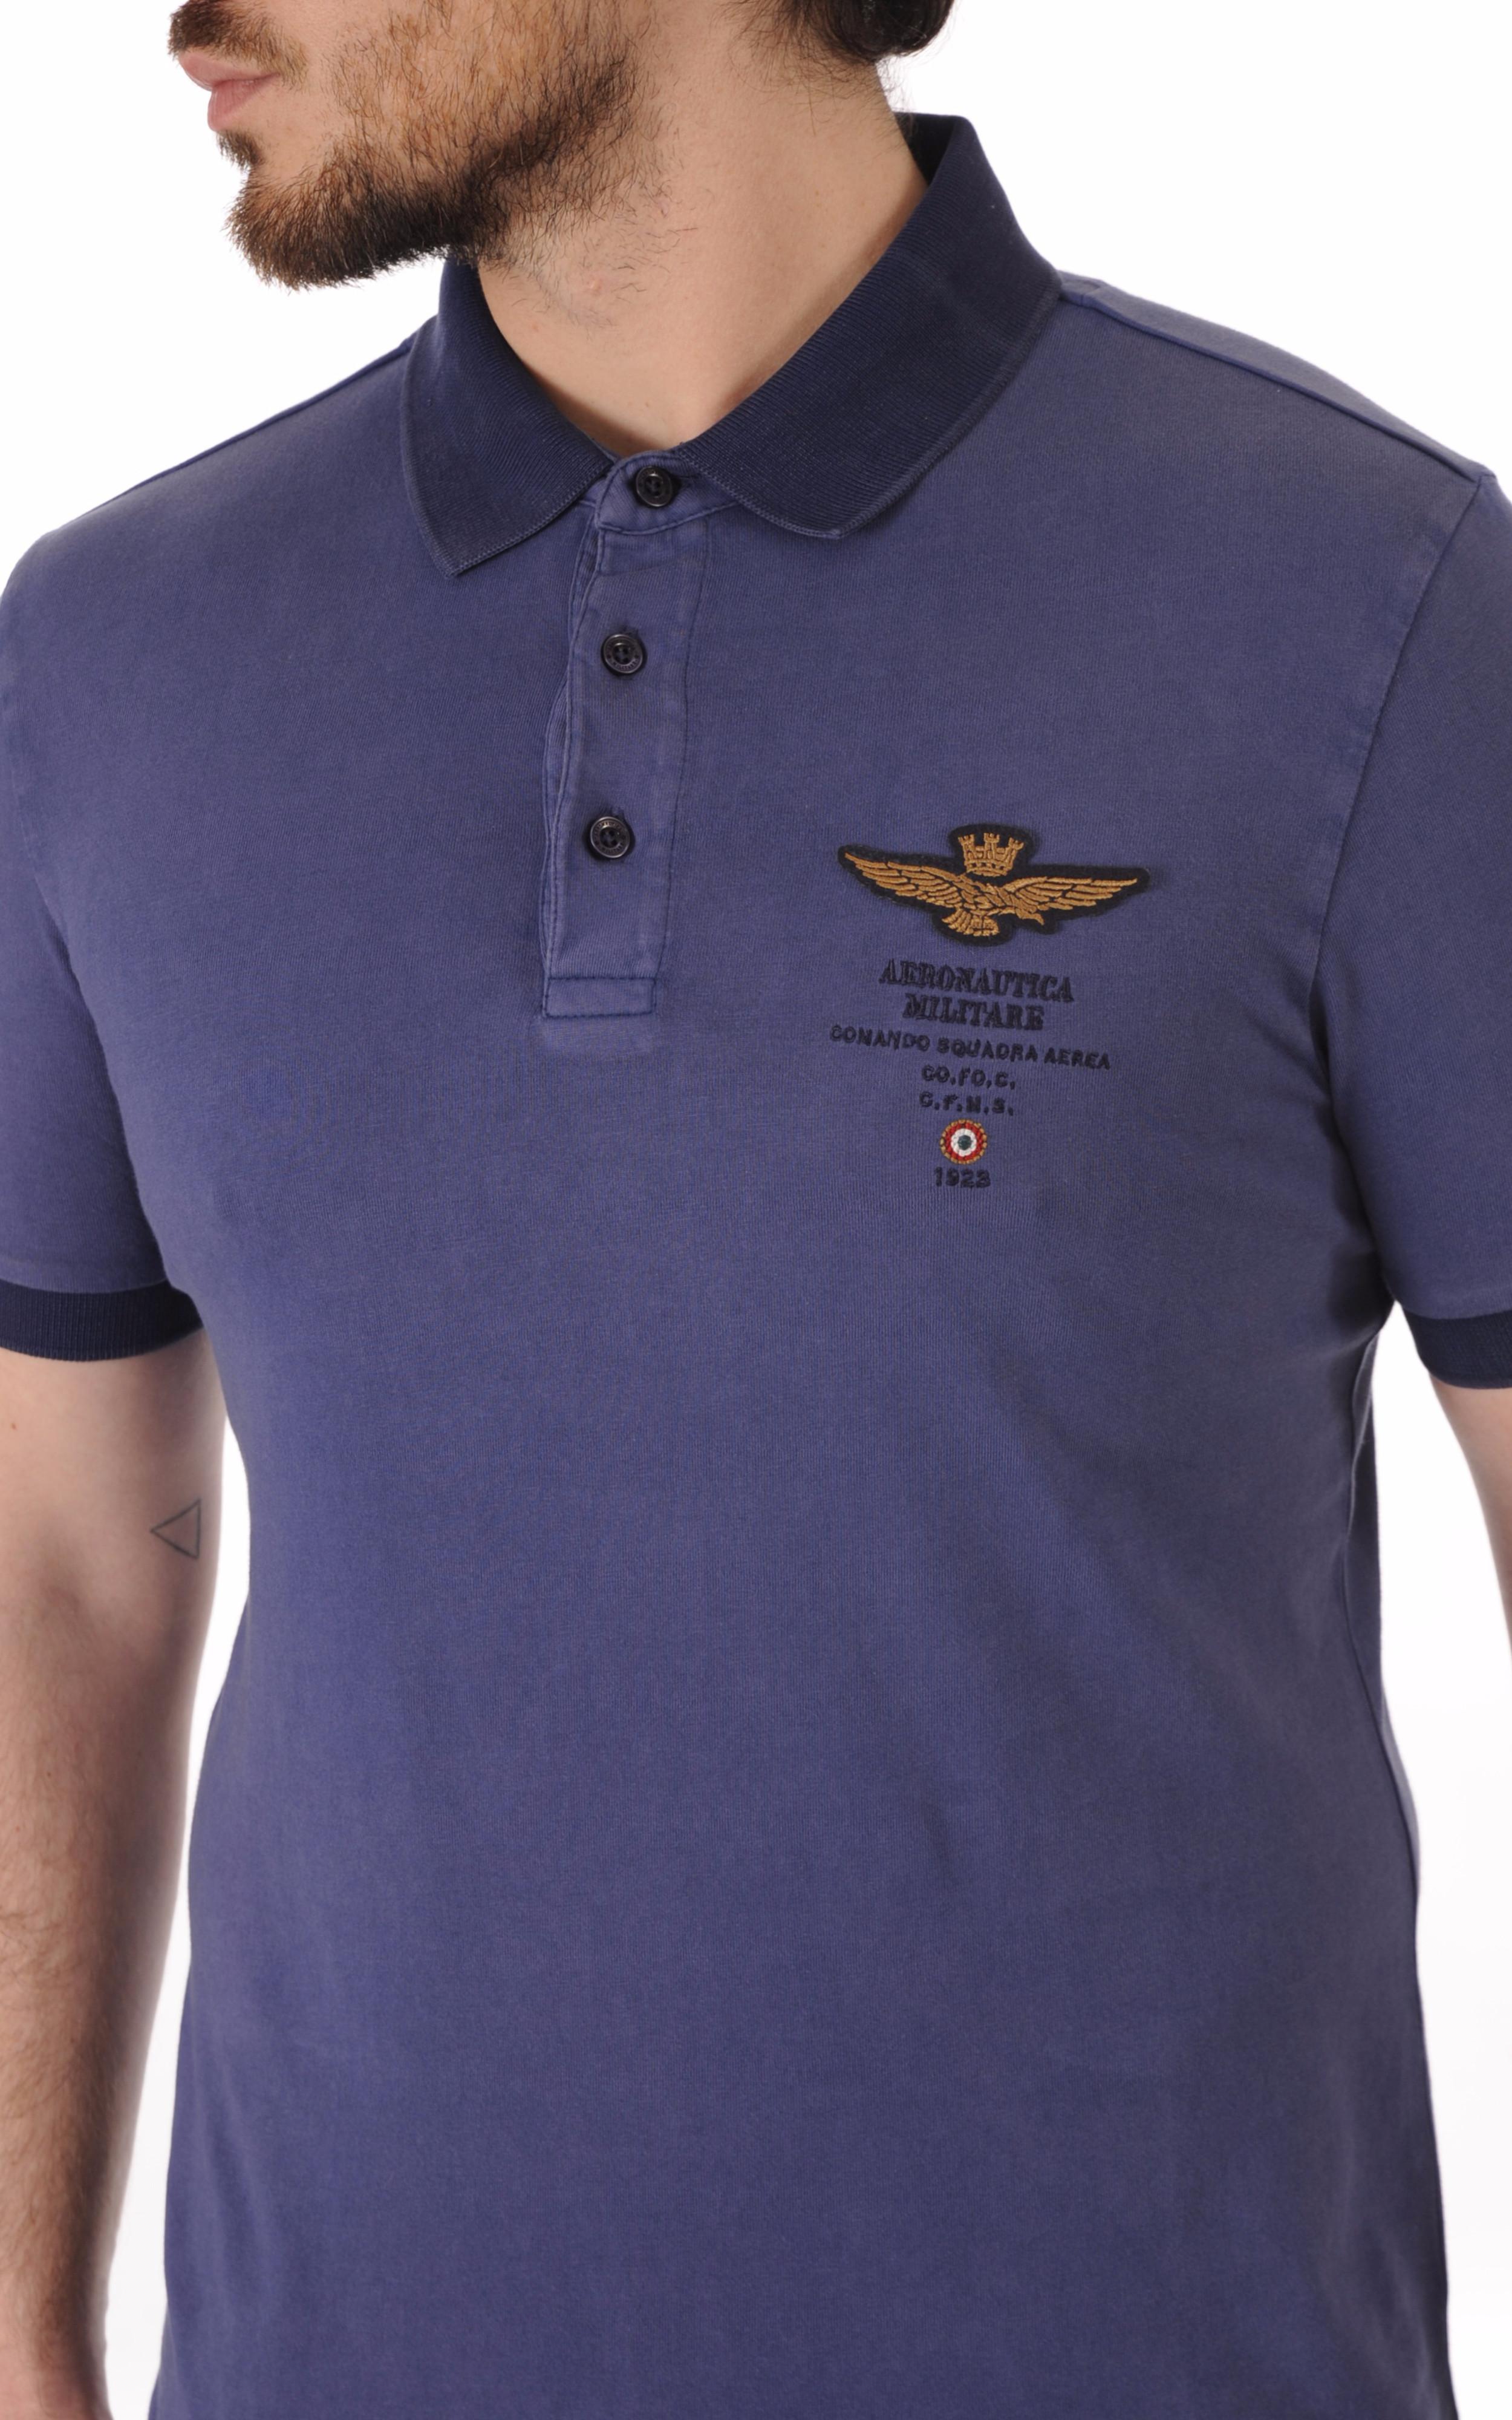 Polo Bleu Comando Squadra Aerea Aeronautica Militare